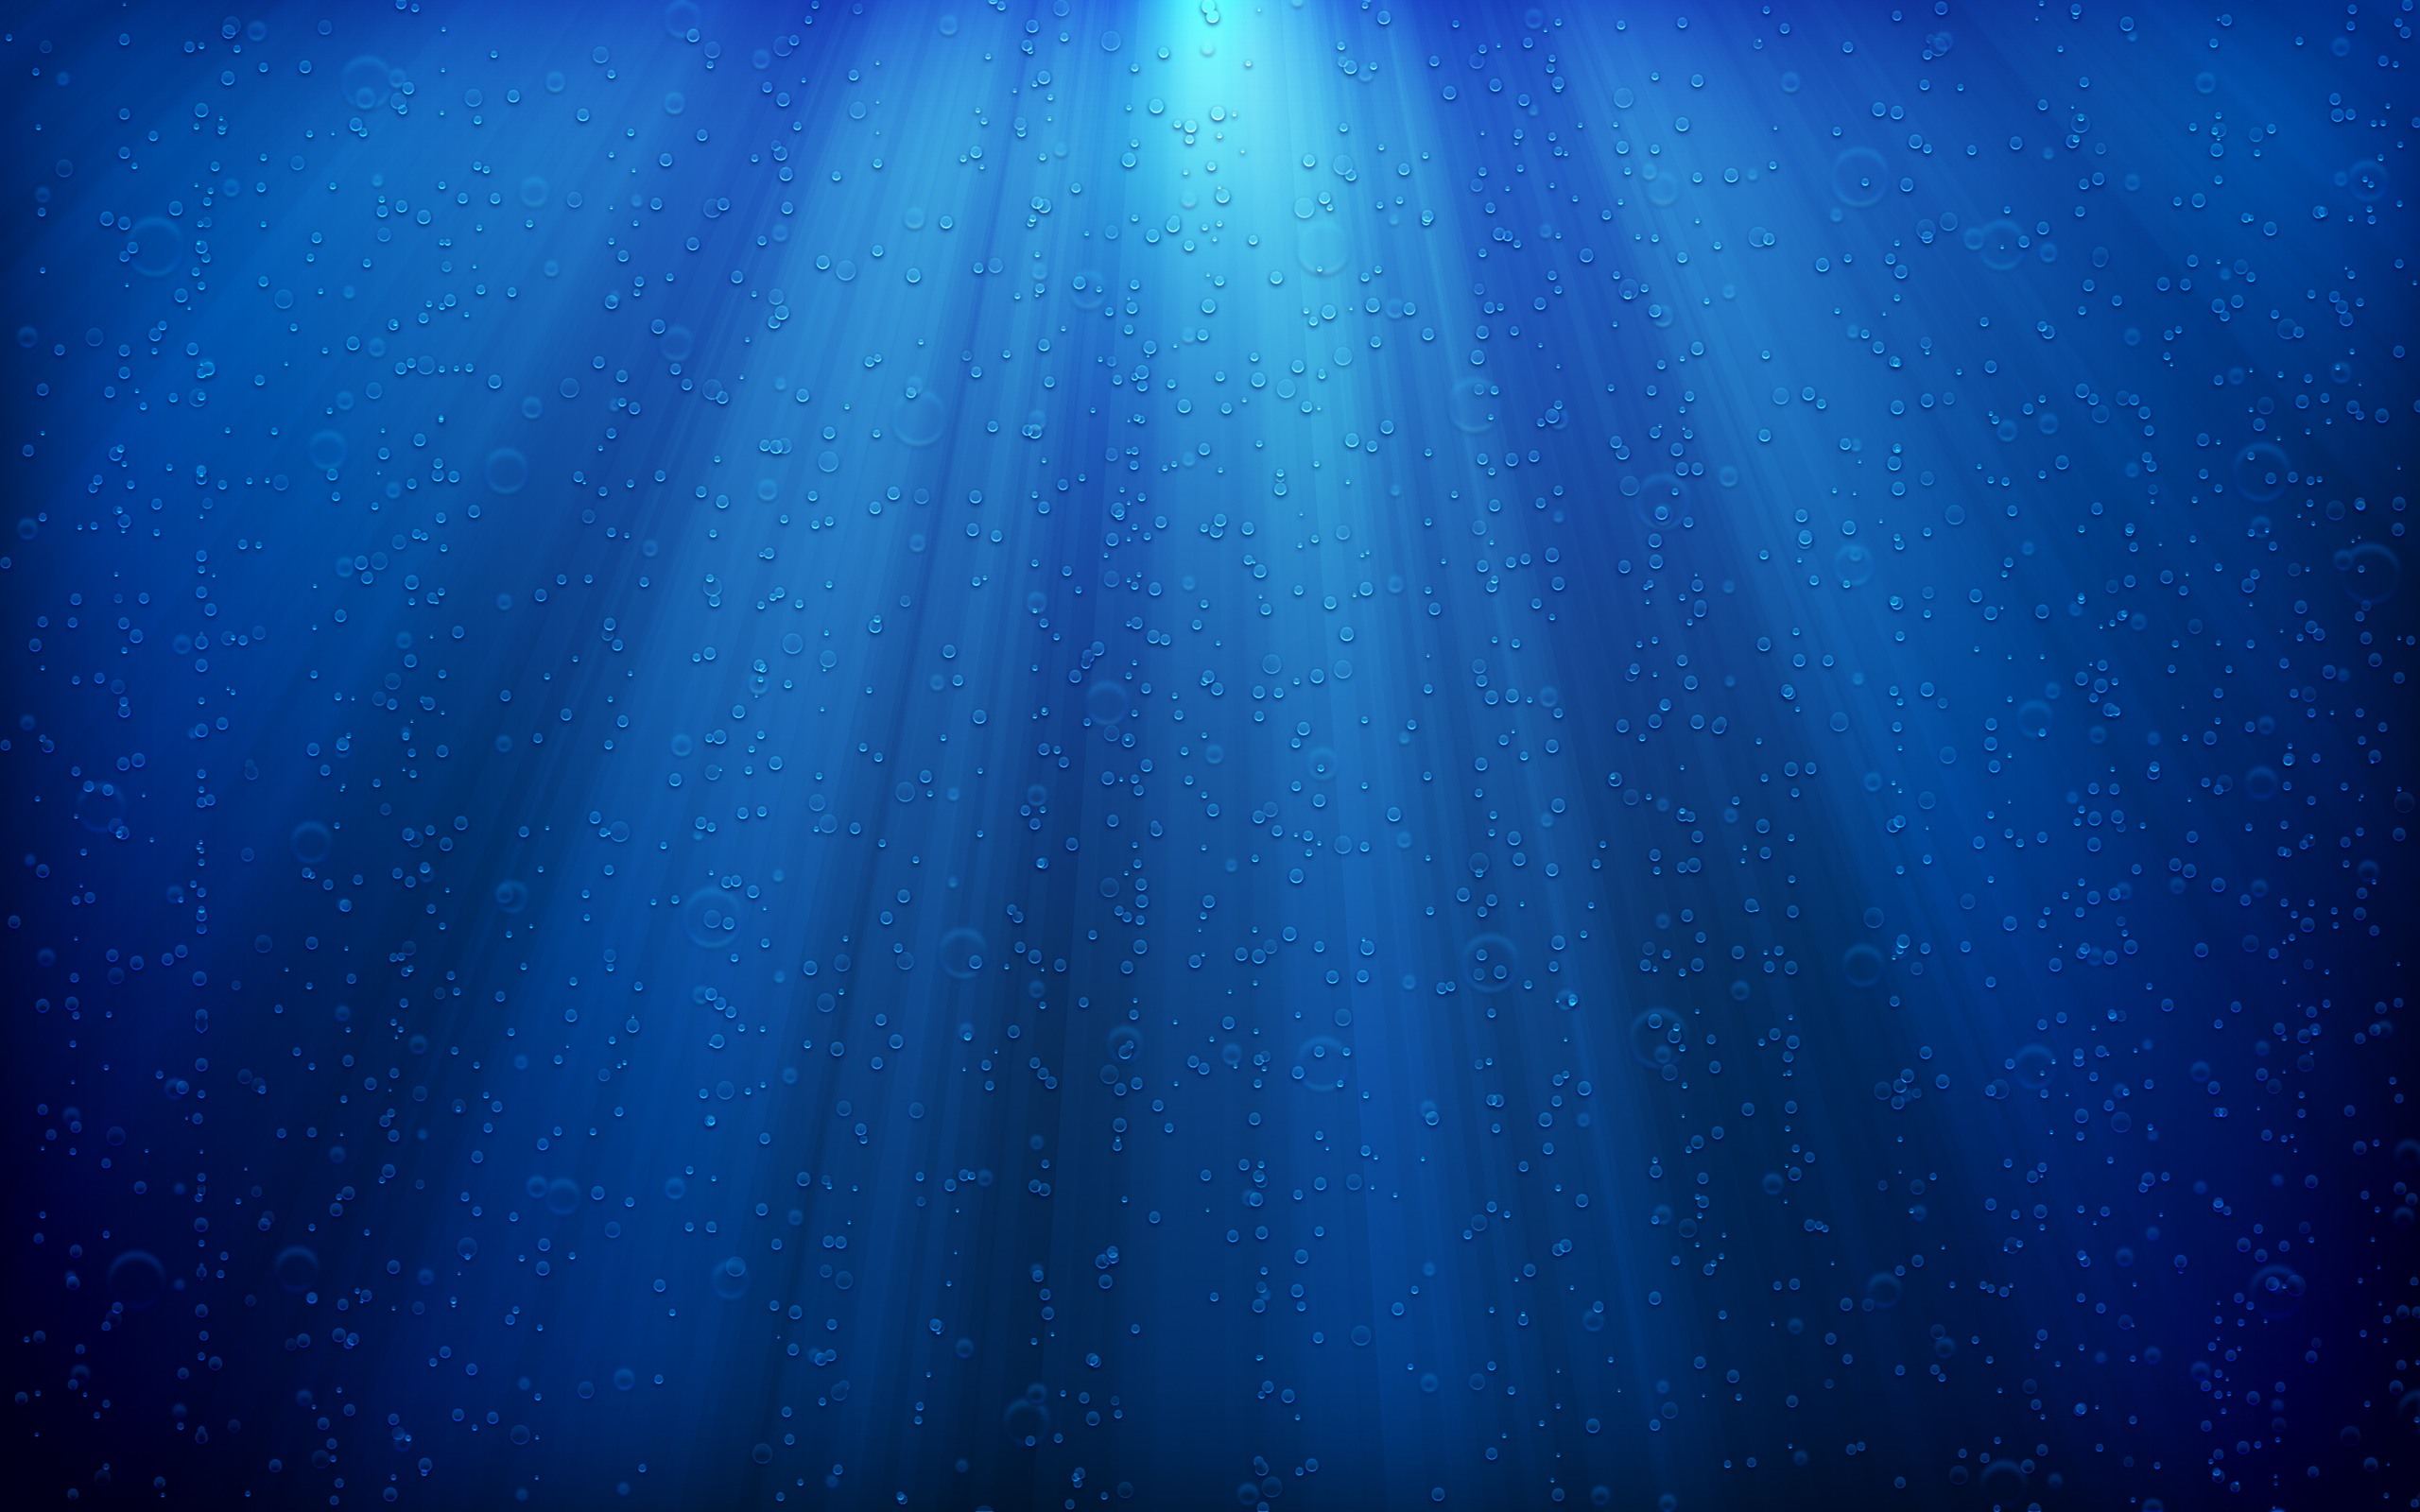 Underwater Wallpapers HD Wallpapers 2560x1600